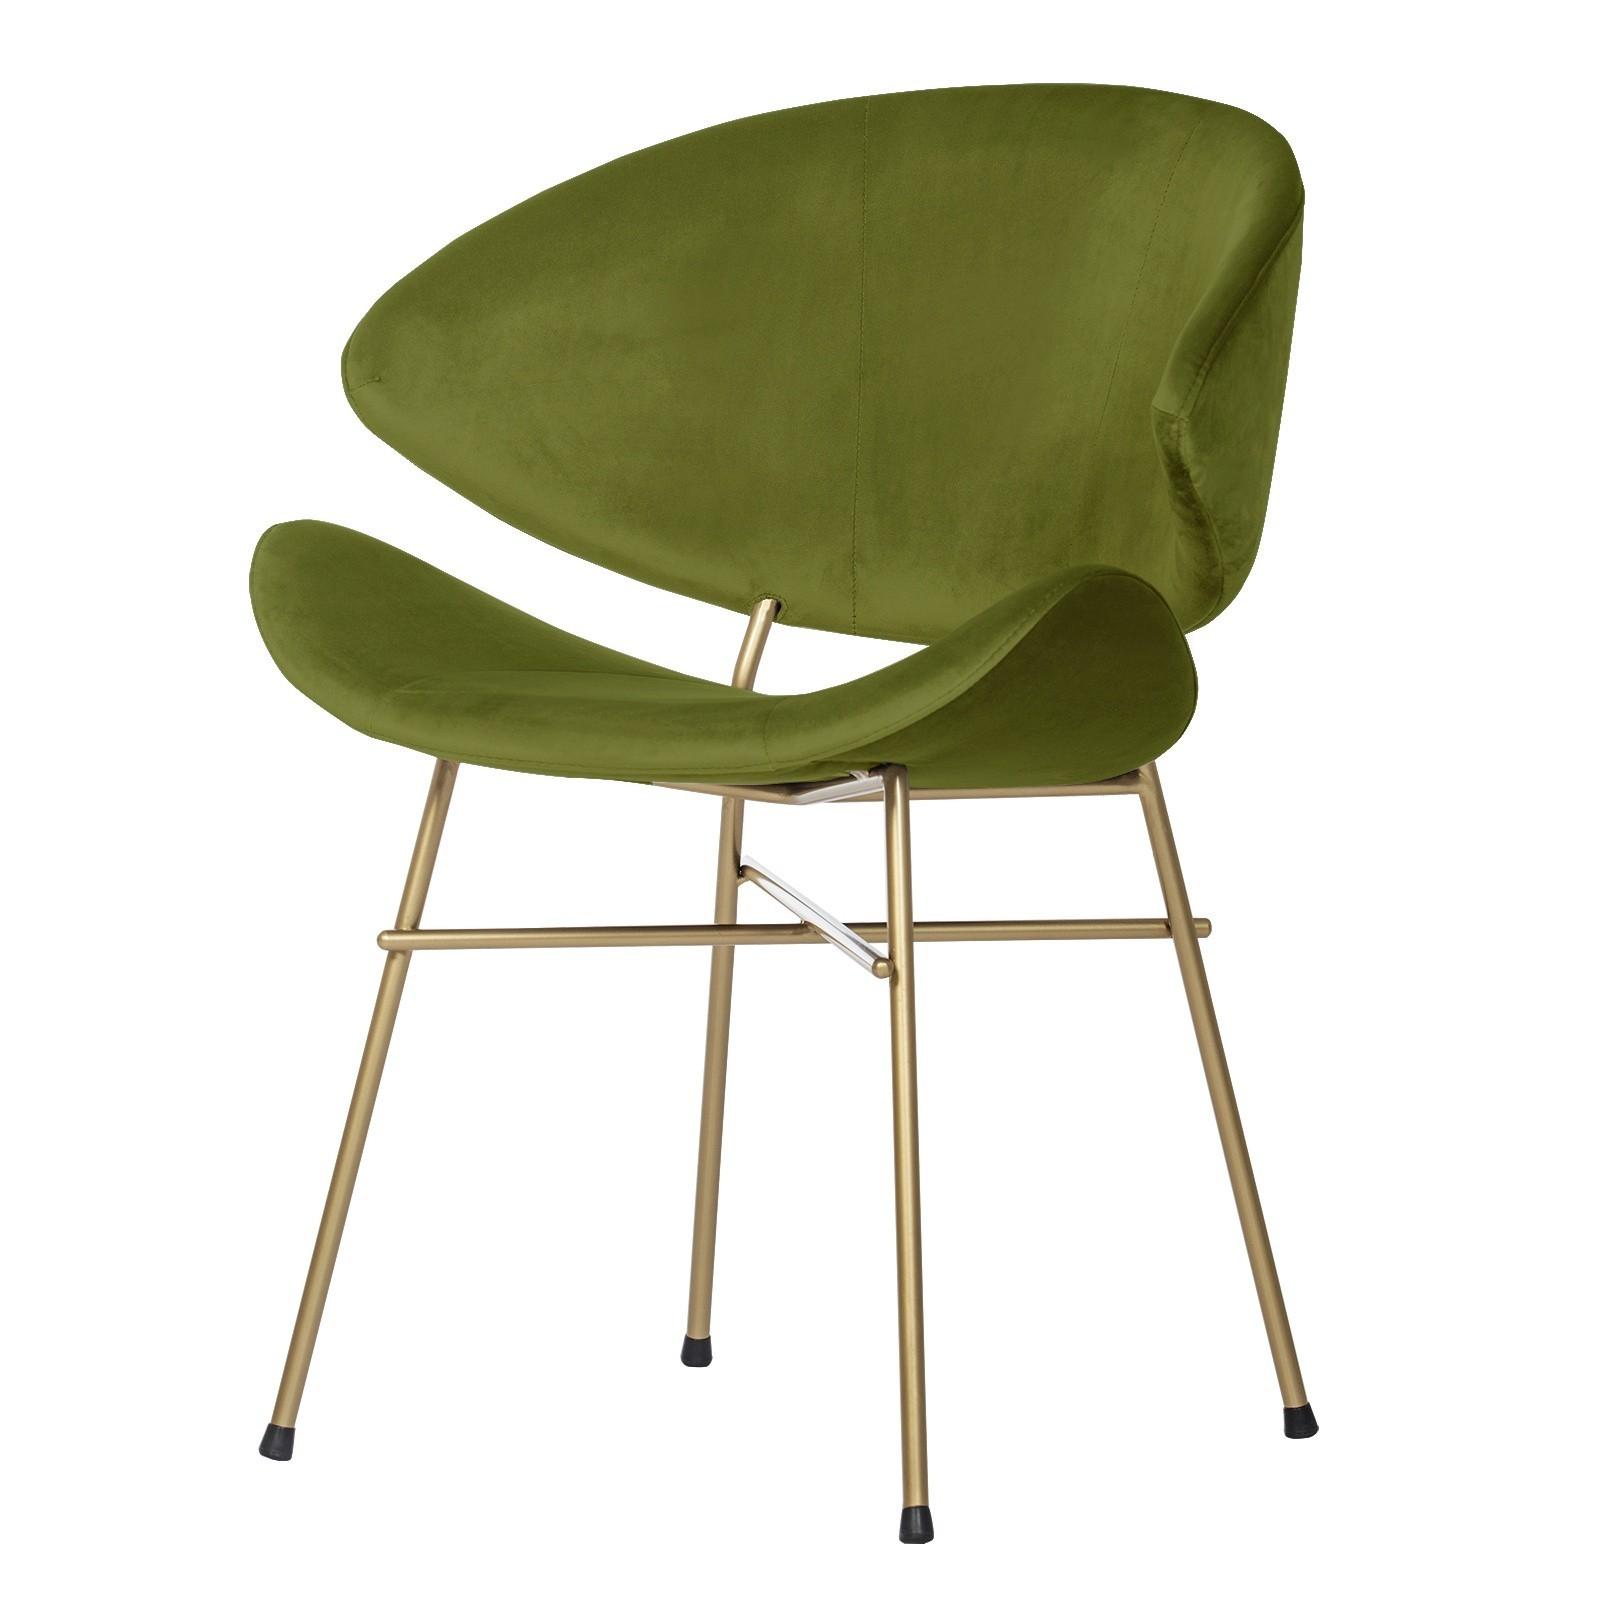 Cheri Gold - velours - chair - green